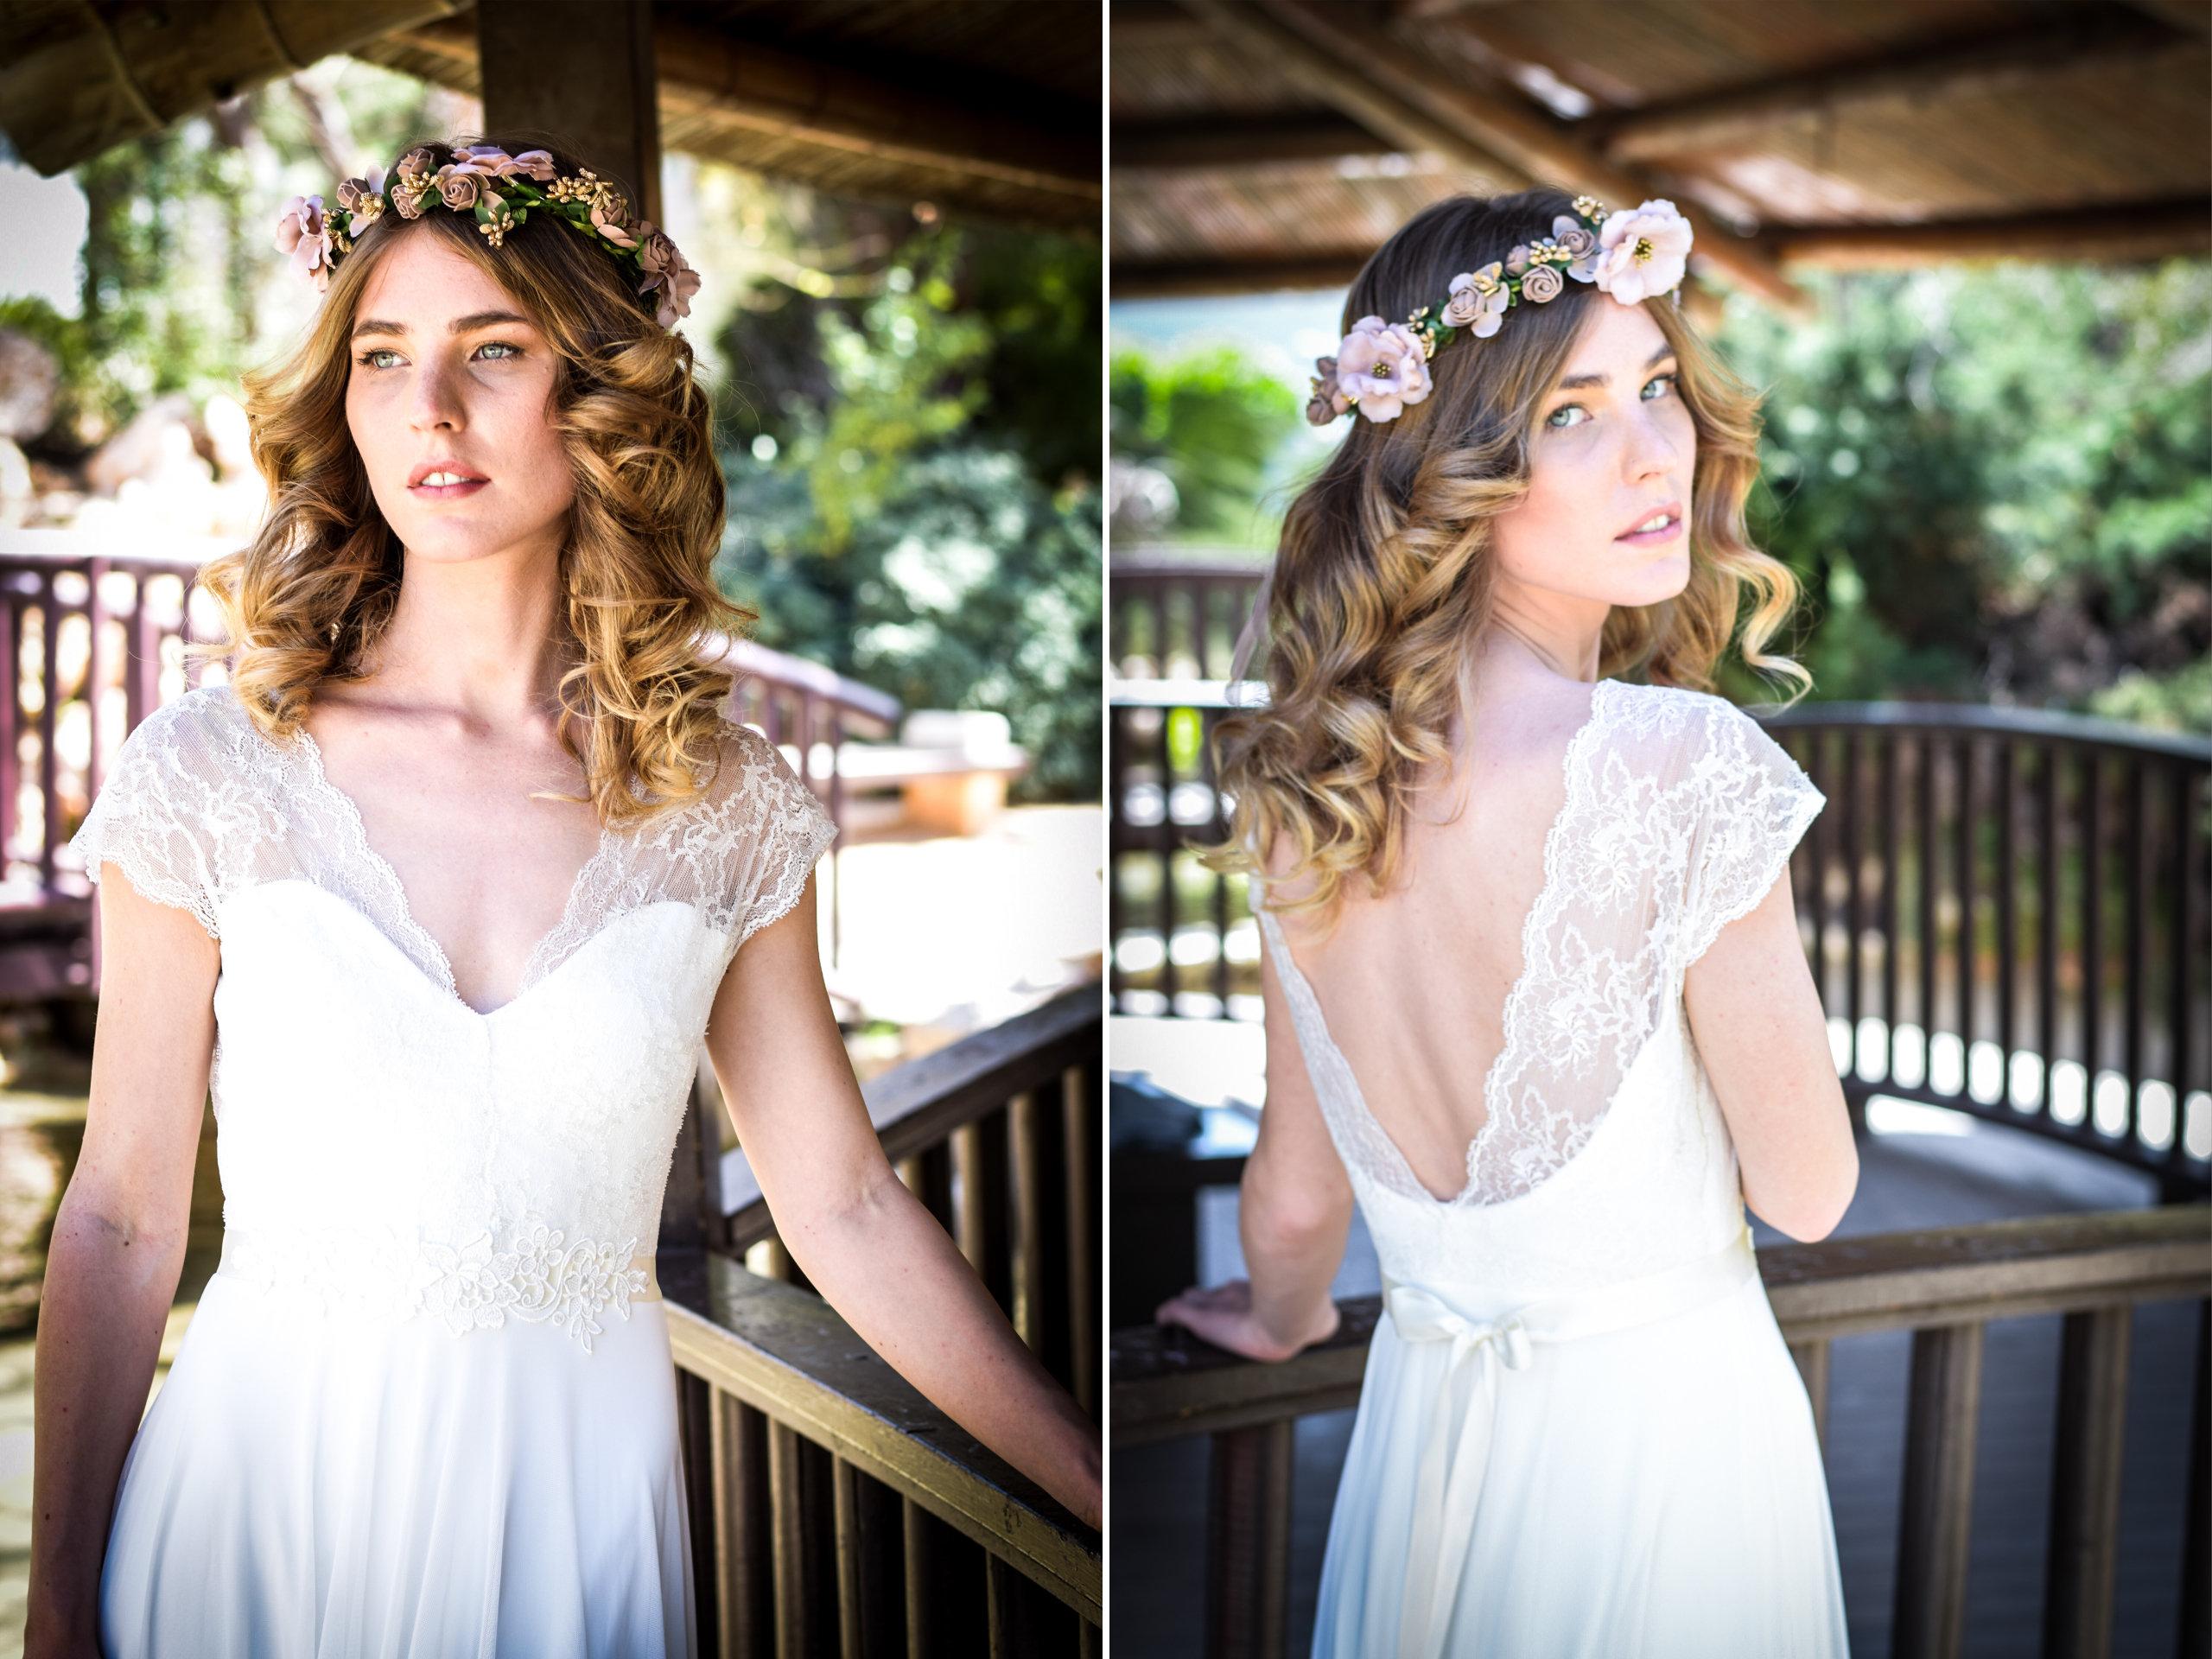 Simple Wedding Dress. Romantic Wedding Gown Boho Dresses